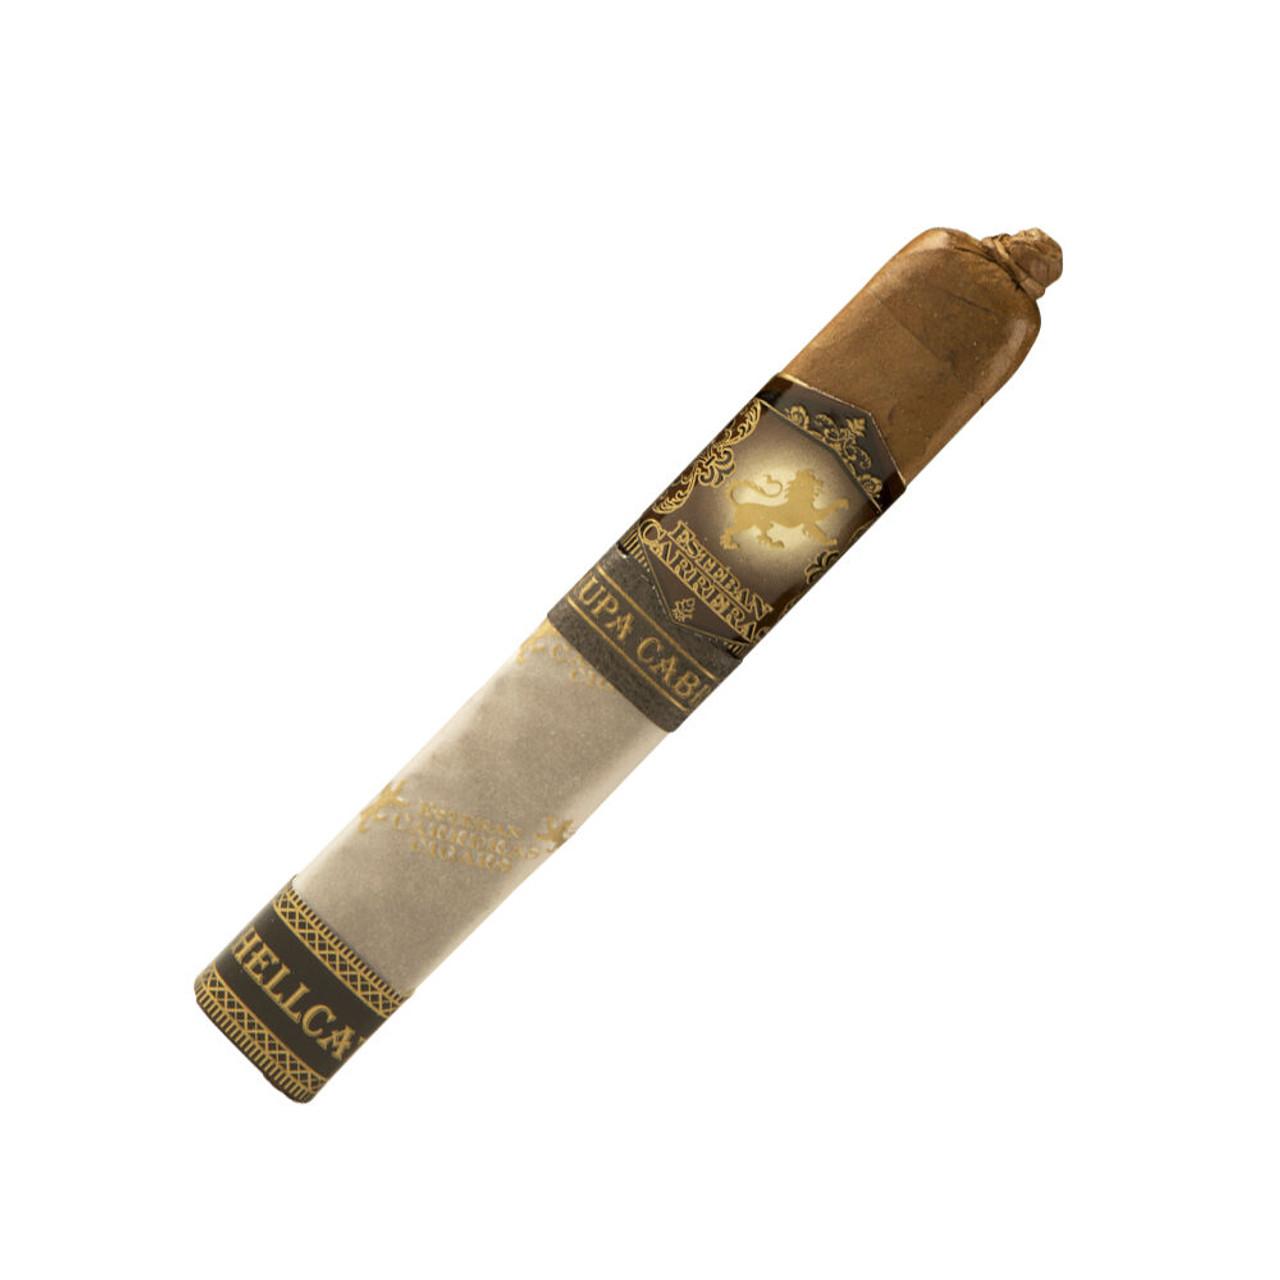 Esteban Carreras Chupacabra Hellcat Robusto Grande Cigars - 5.5 x 54 (Box of 10)